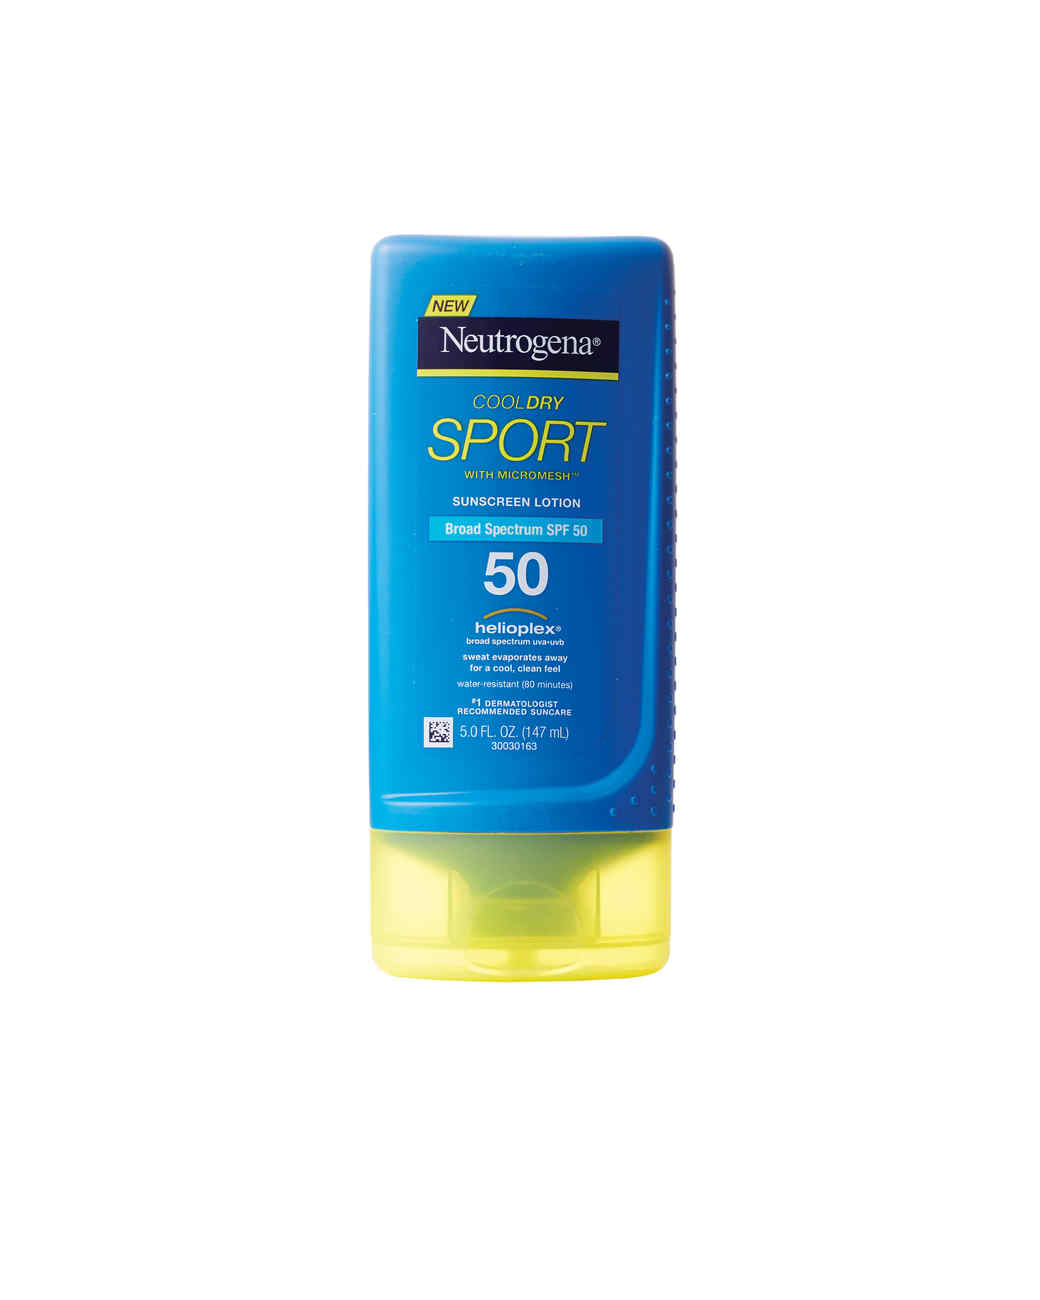 sunscreens-022-d113014_l.jpg